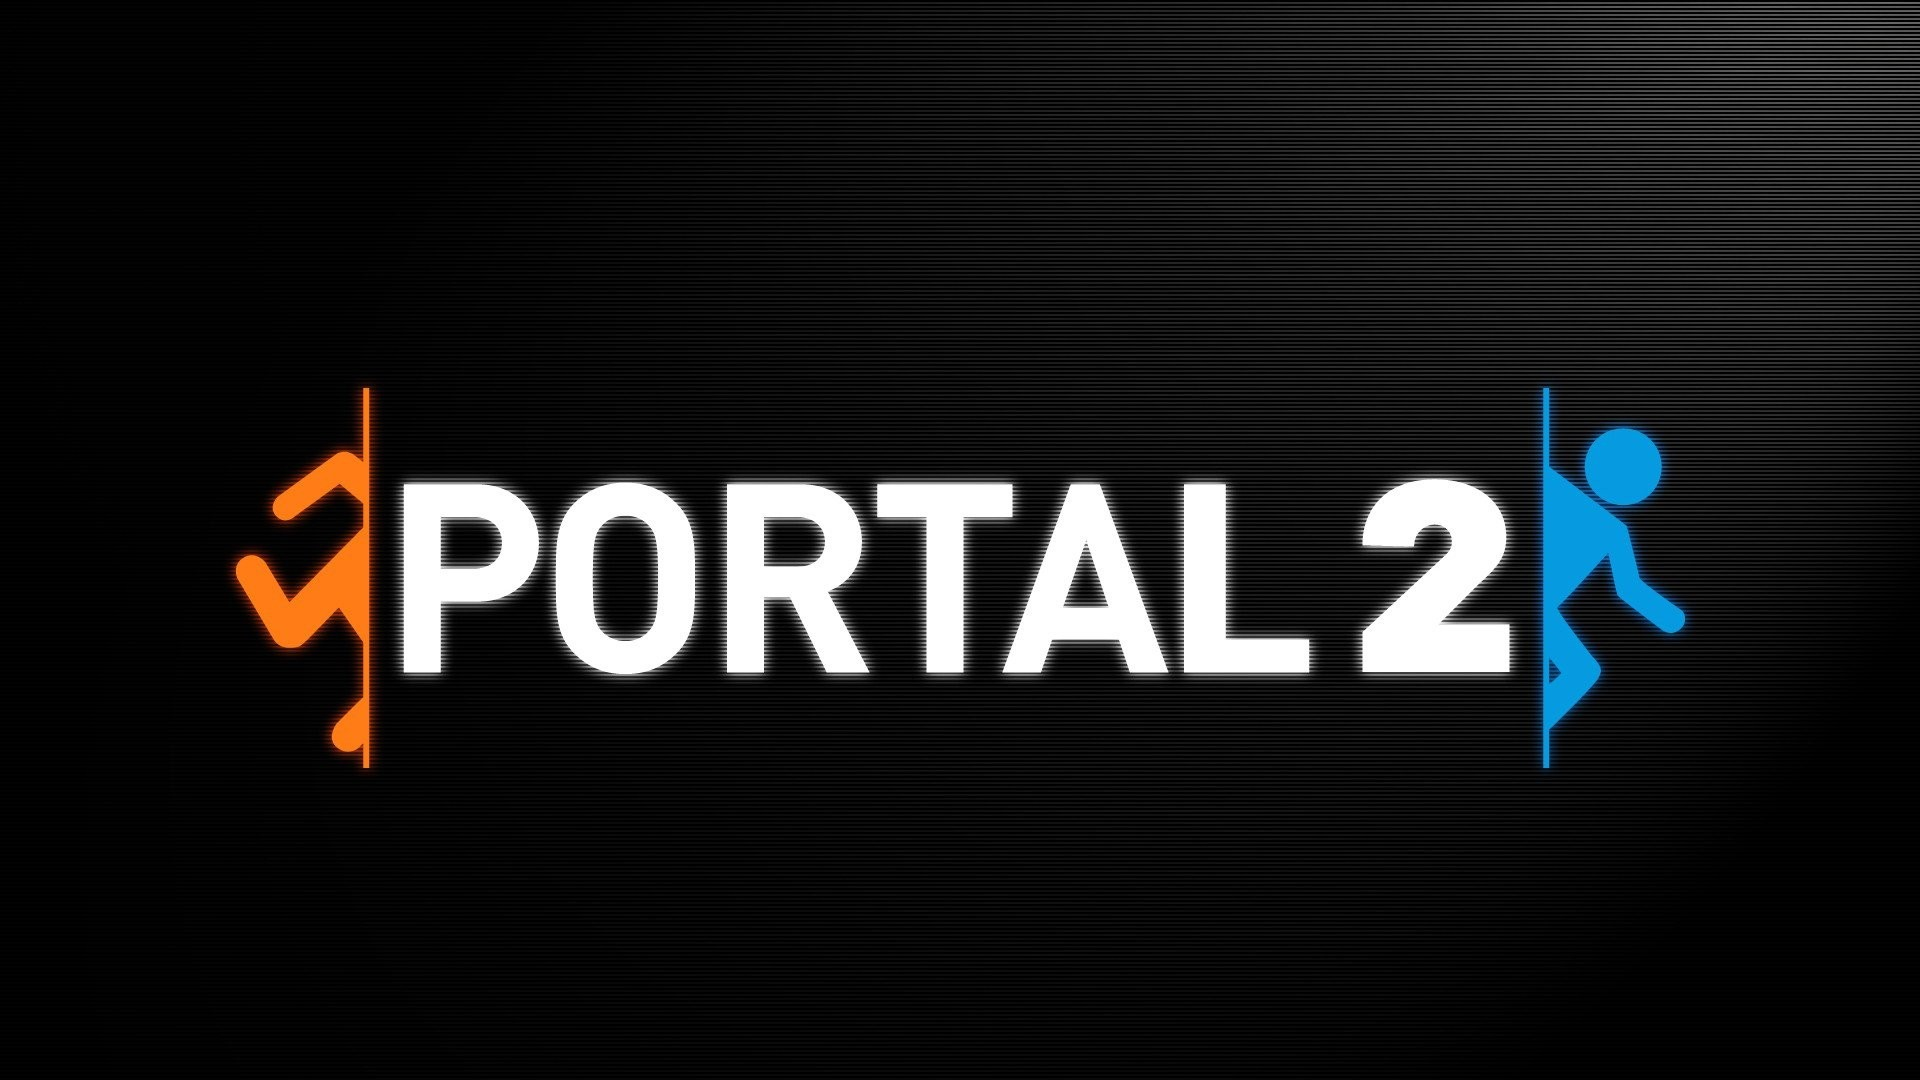 Portal 2 Video Games Valve Simple Black Background Minimalism …